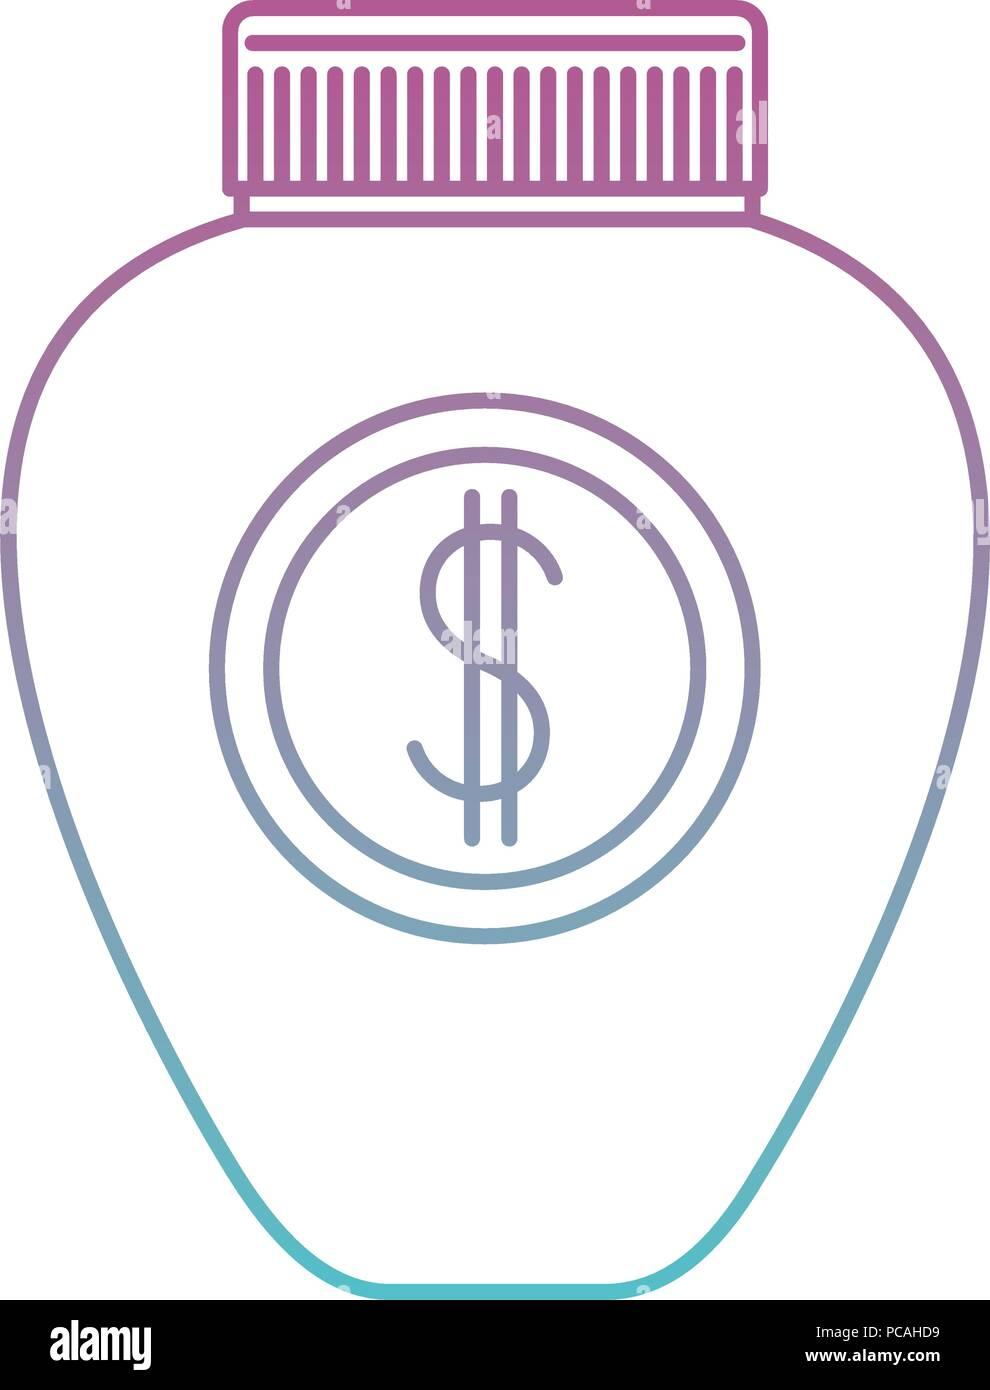 jar with money symbol - Stock Image